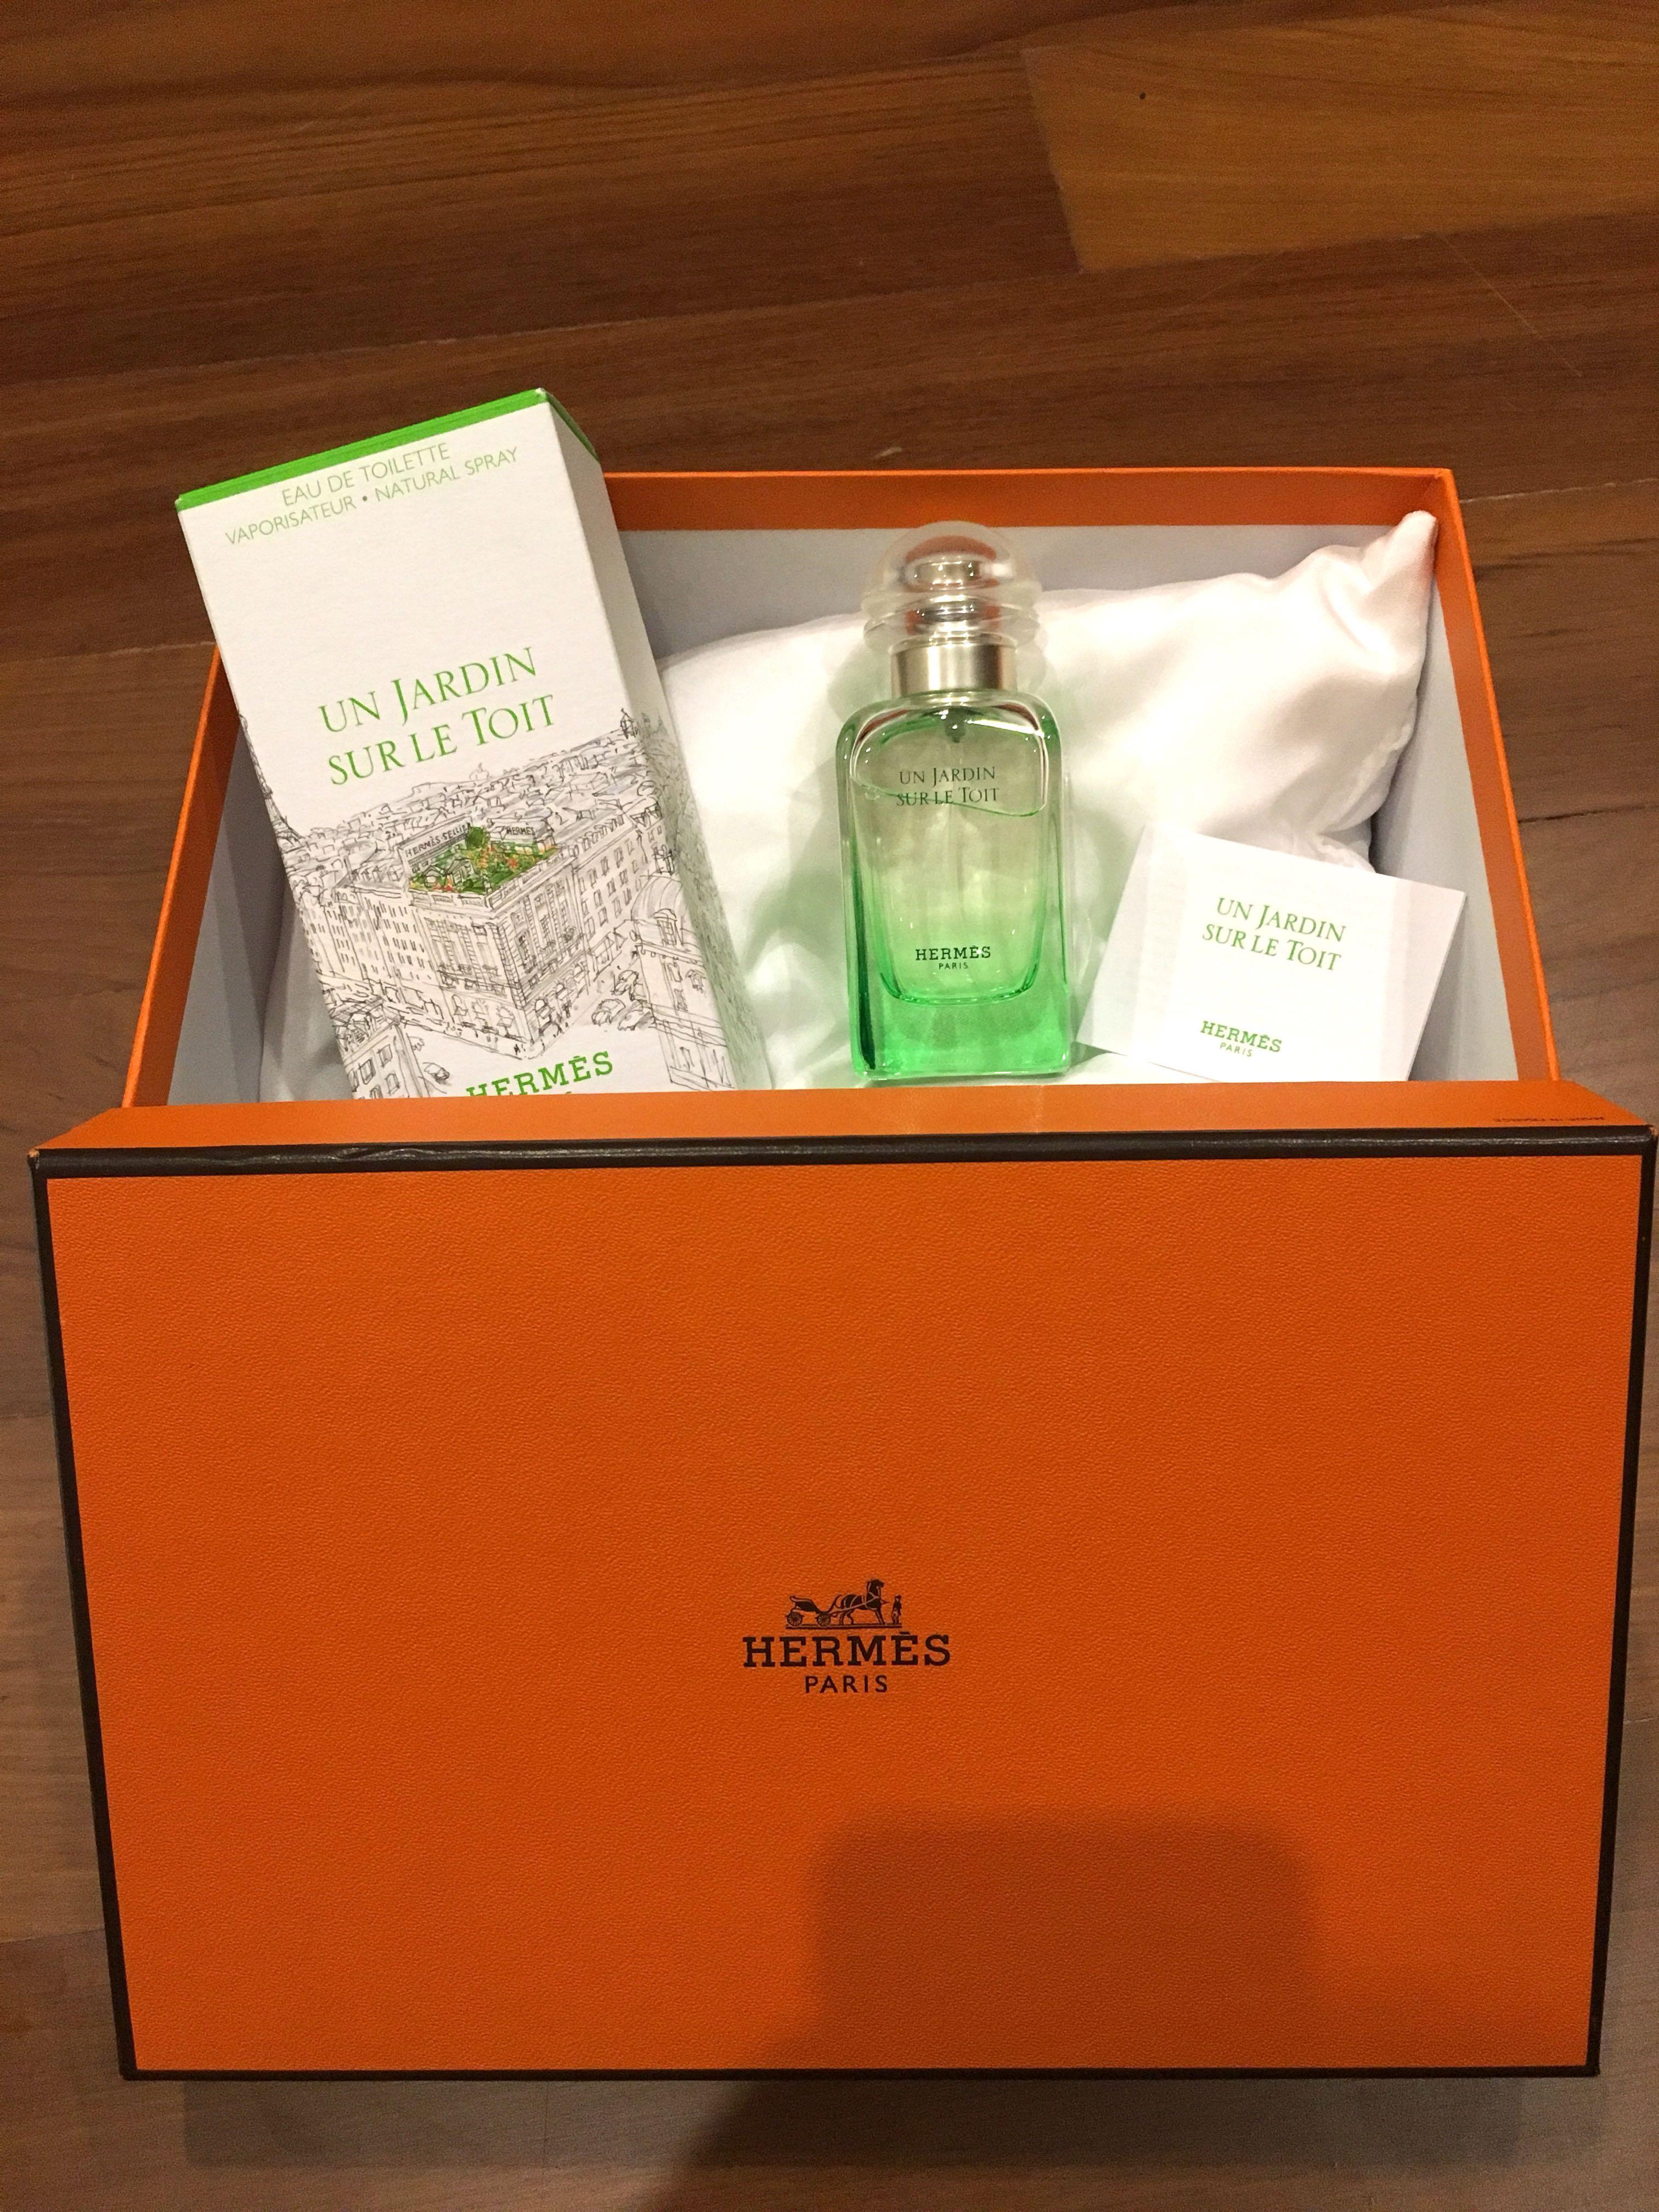 Hermes Perfume Un Jardin Sur Le Toit 50ml Health Beauty Perfumes